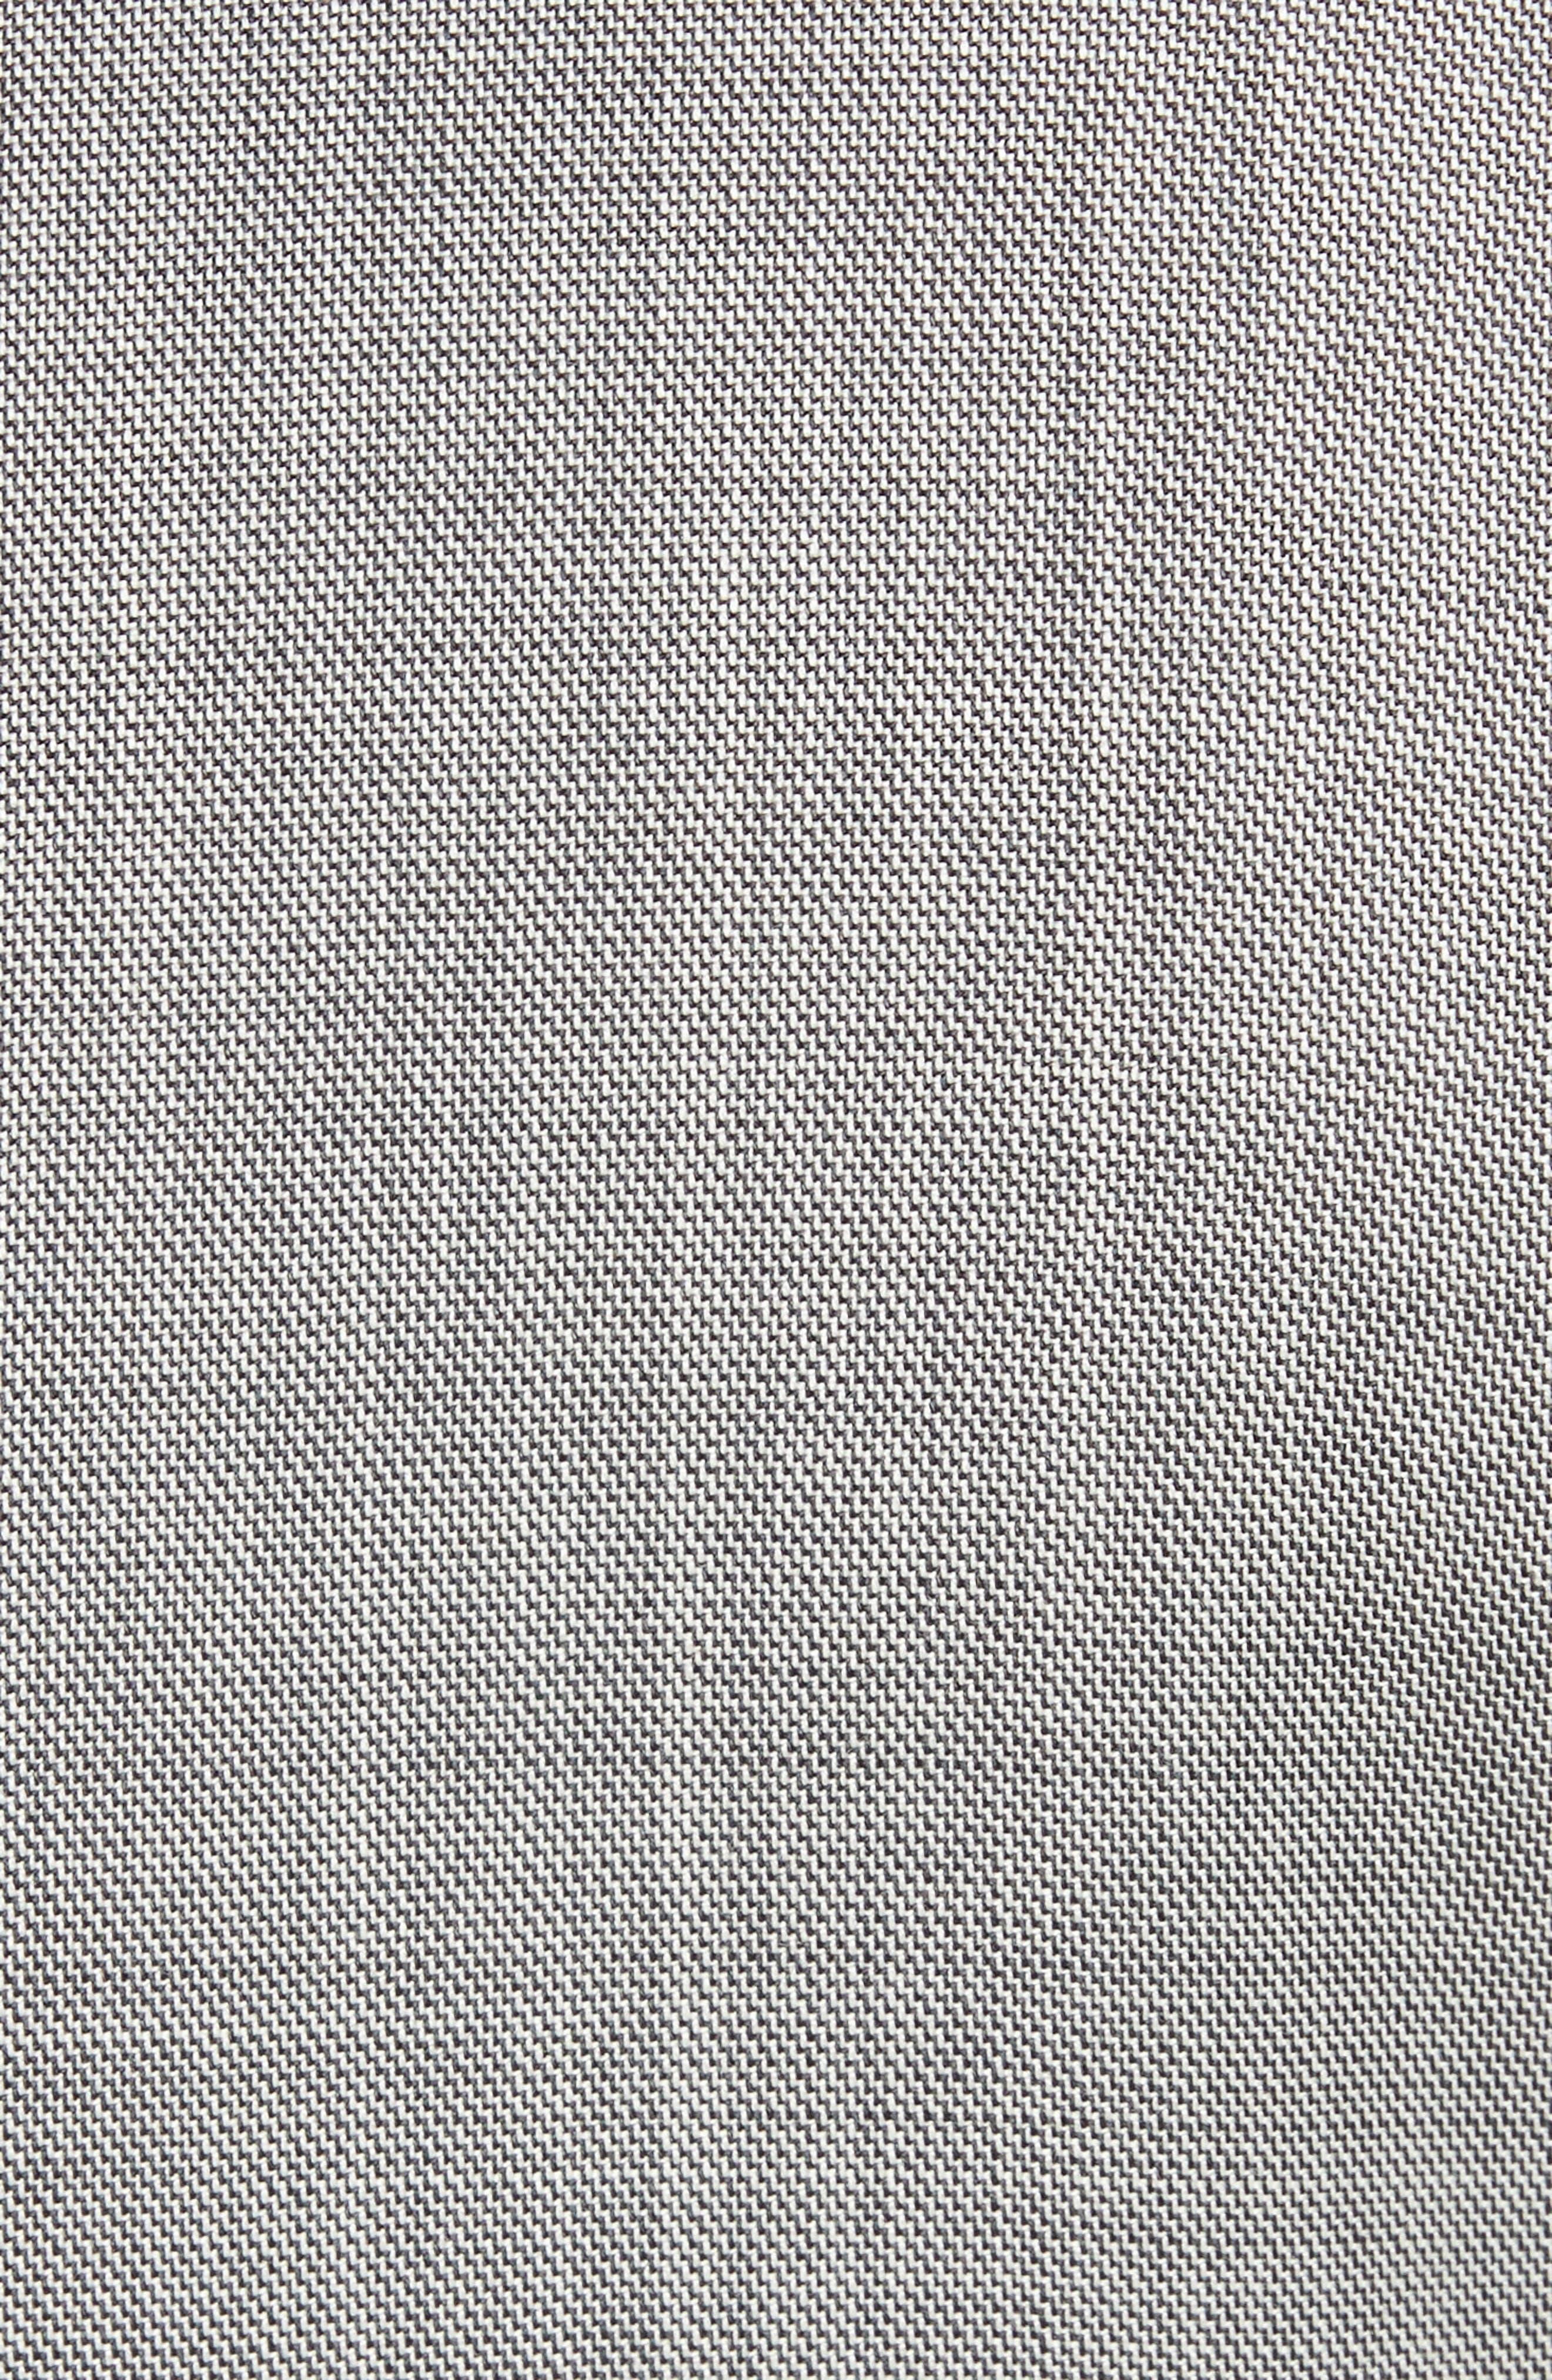 Jay Trim Fit Solid Wool Suit,                             Alternate thumbnail 7, color,                             LIGHT GREY